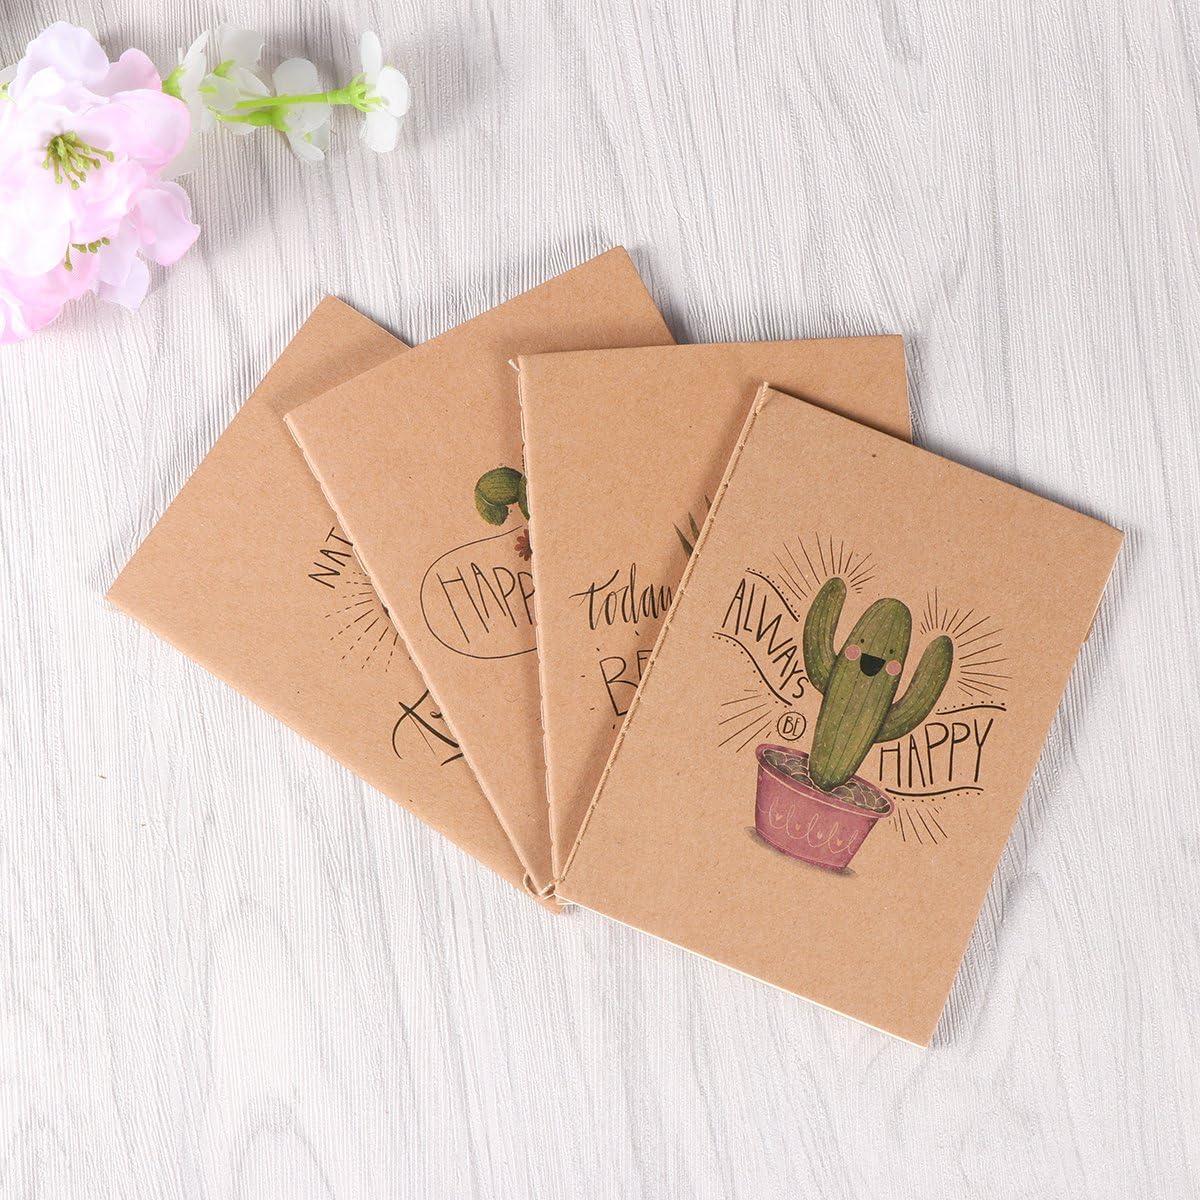 24Pcs NUOLUX Brown Paper Notebook Cute Journals Travelers Kraft Paper Notebook Bulk 64K Cactus Series